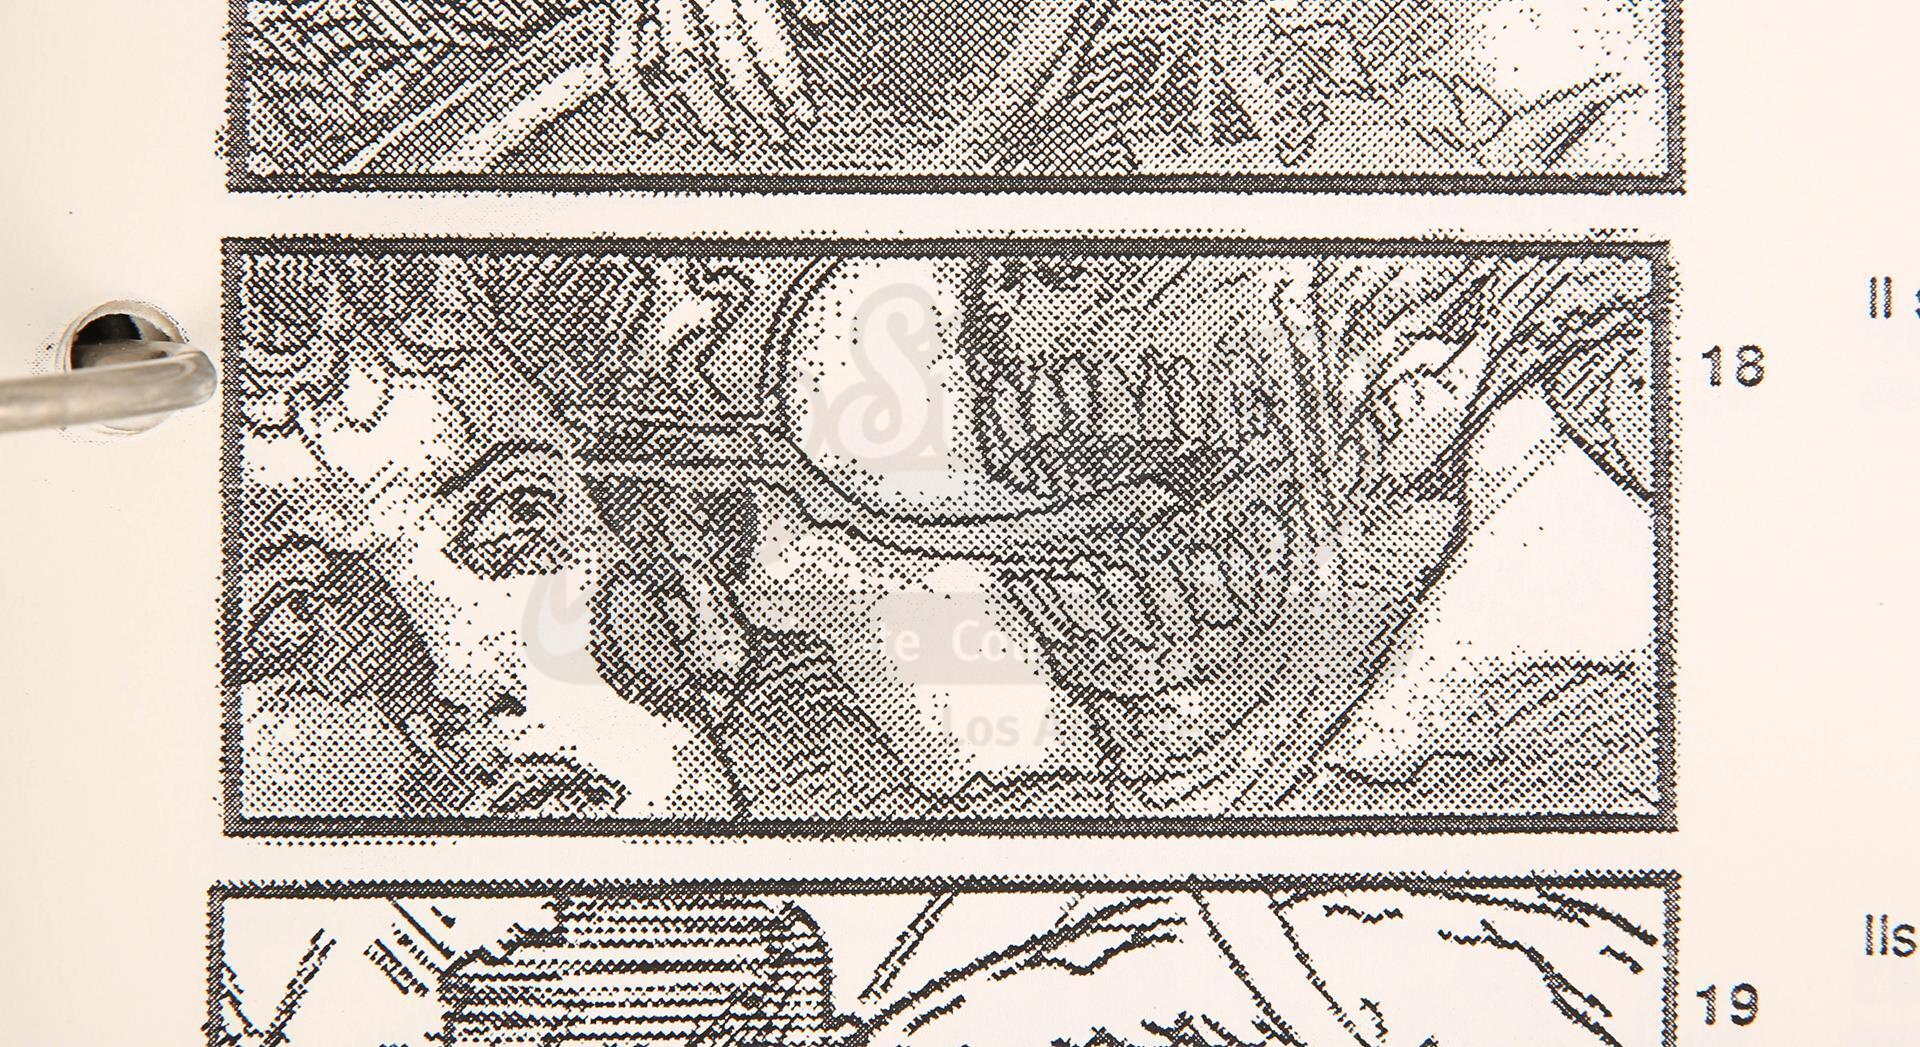 ALIEN RESURRECTION (1997) - Jean-Pierre Jeunet's Personal Storyboard Binder - Image 10 of 10